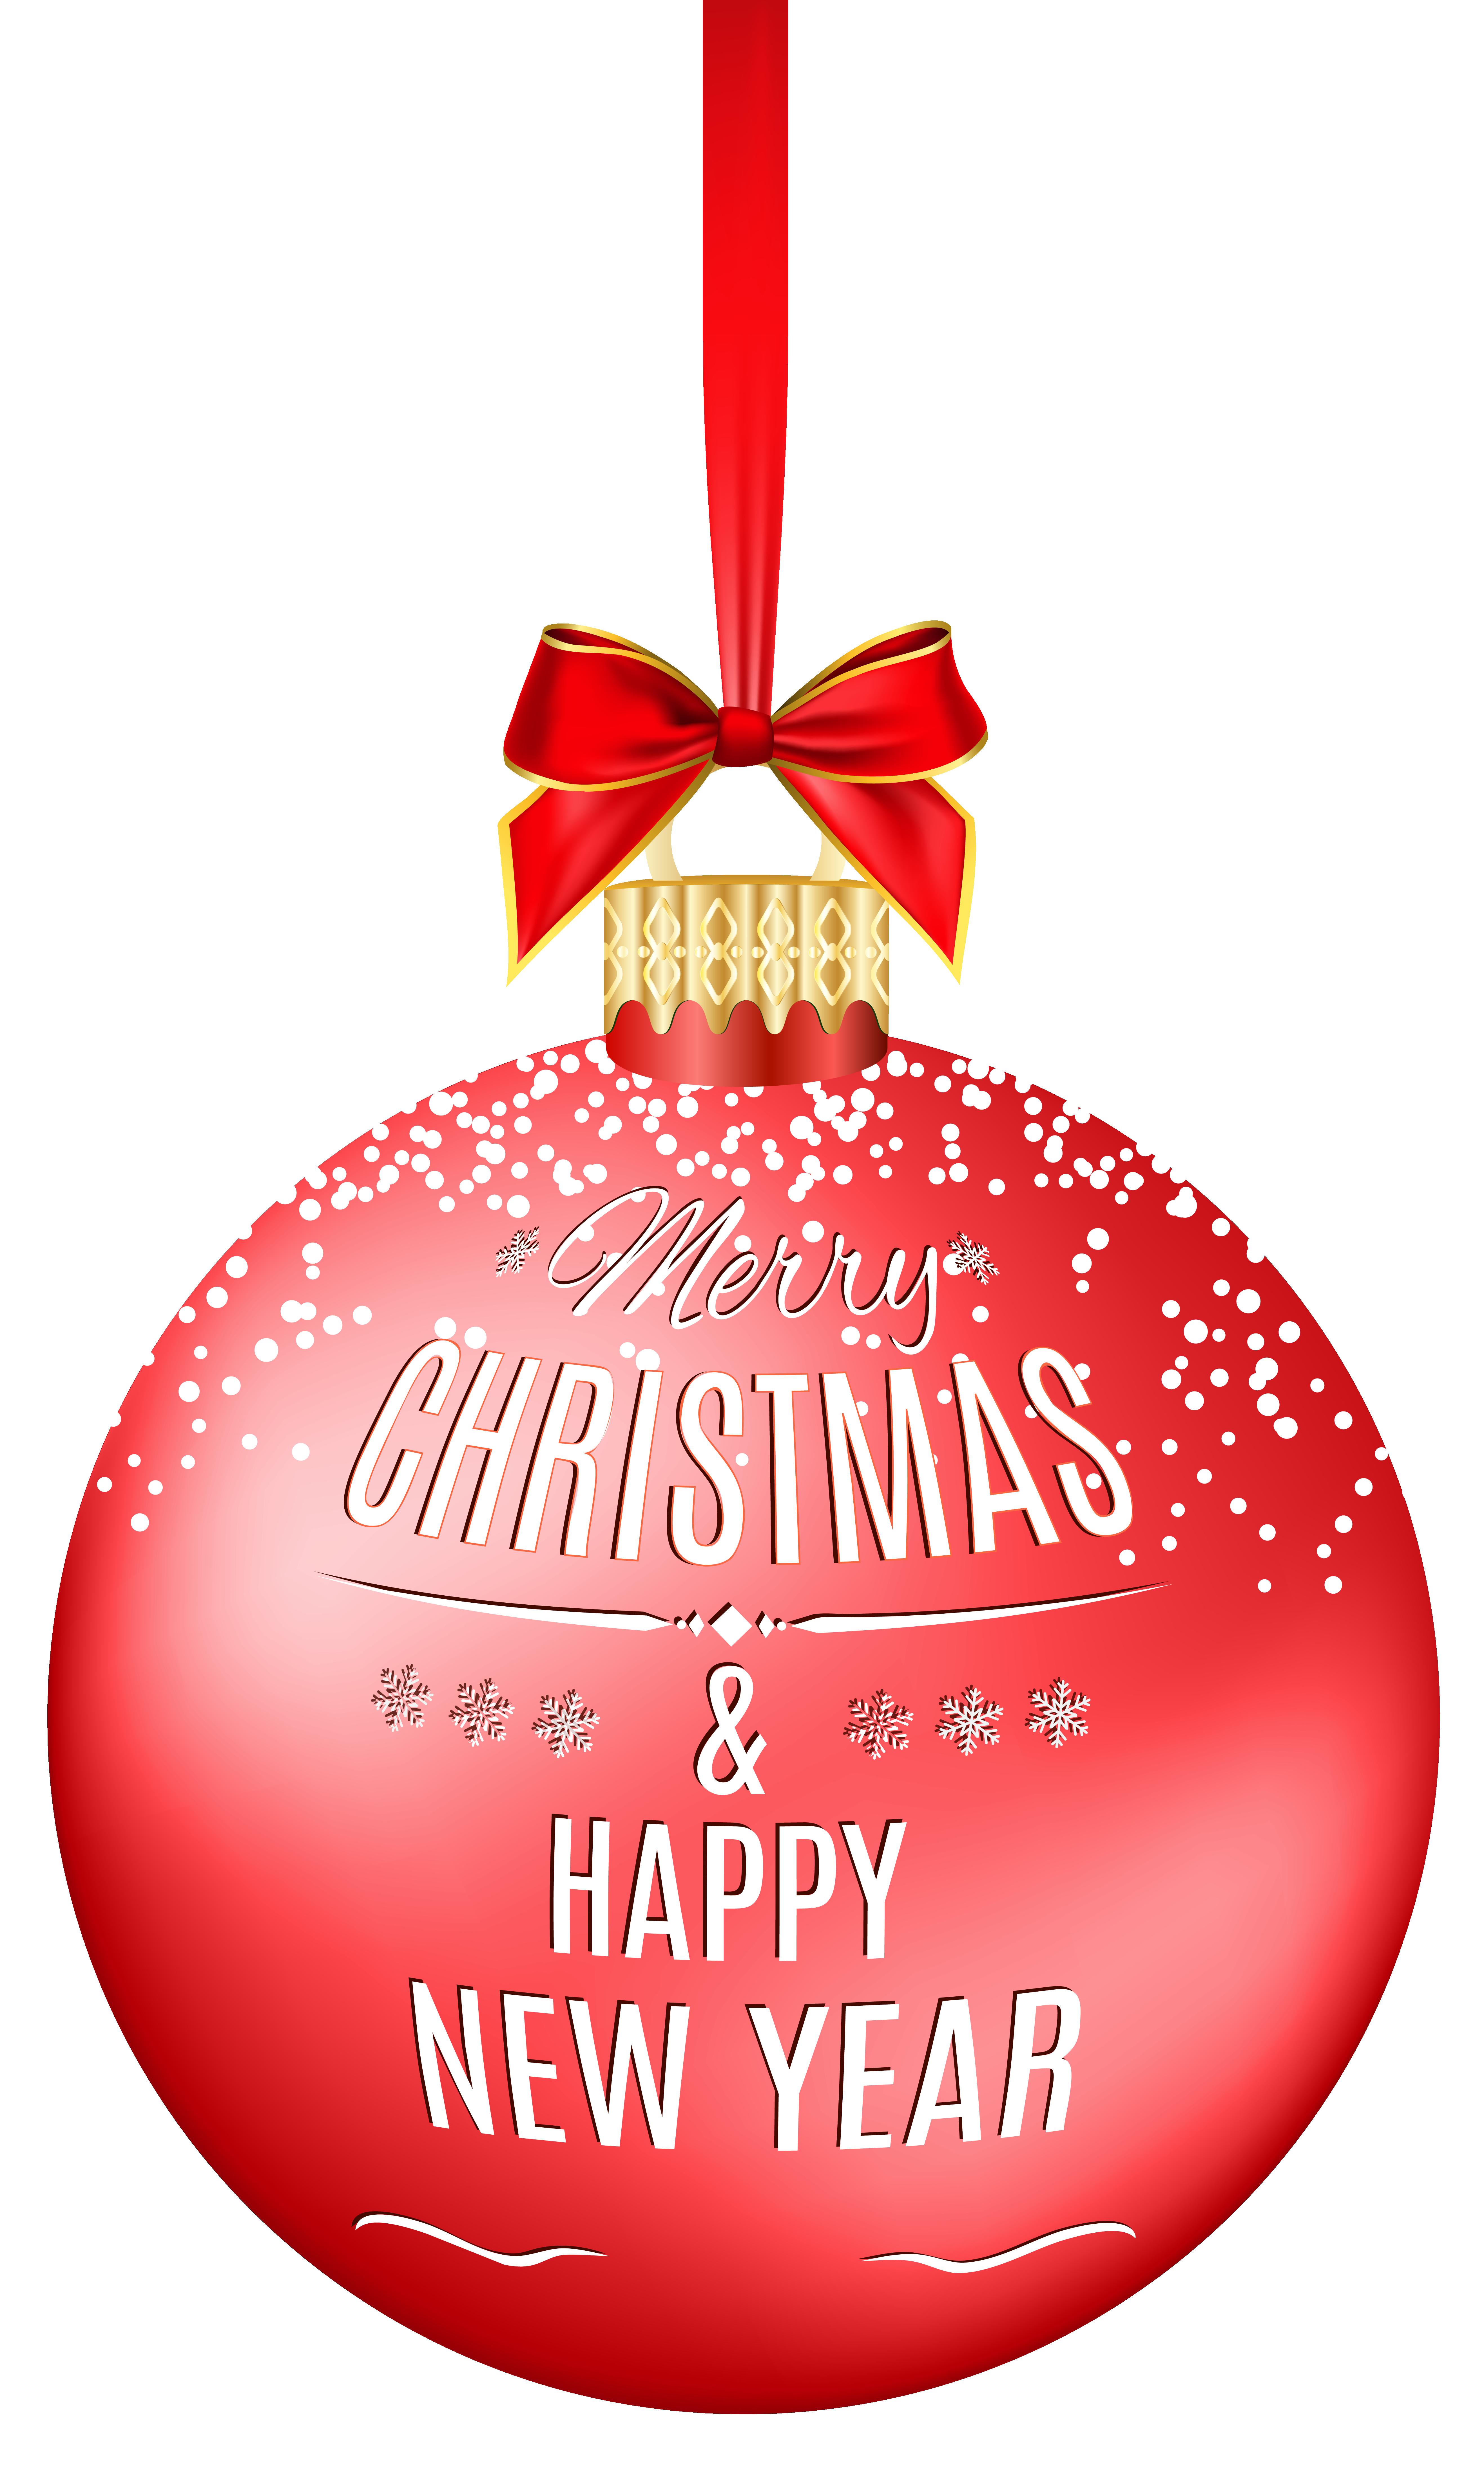 5271x8785 Merry Christmas Ball Transparent Png Clip Art Imageu200b Gallery